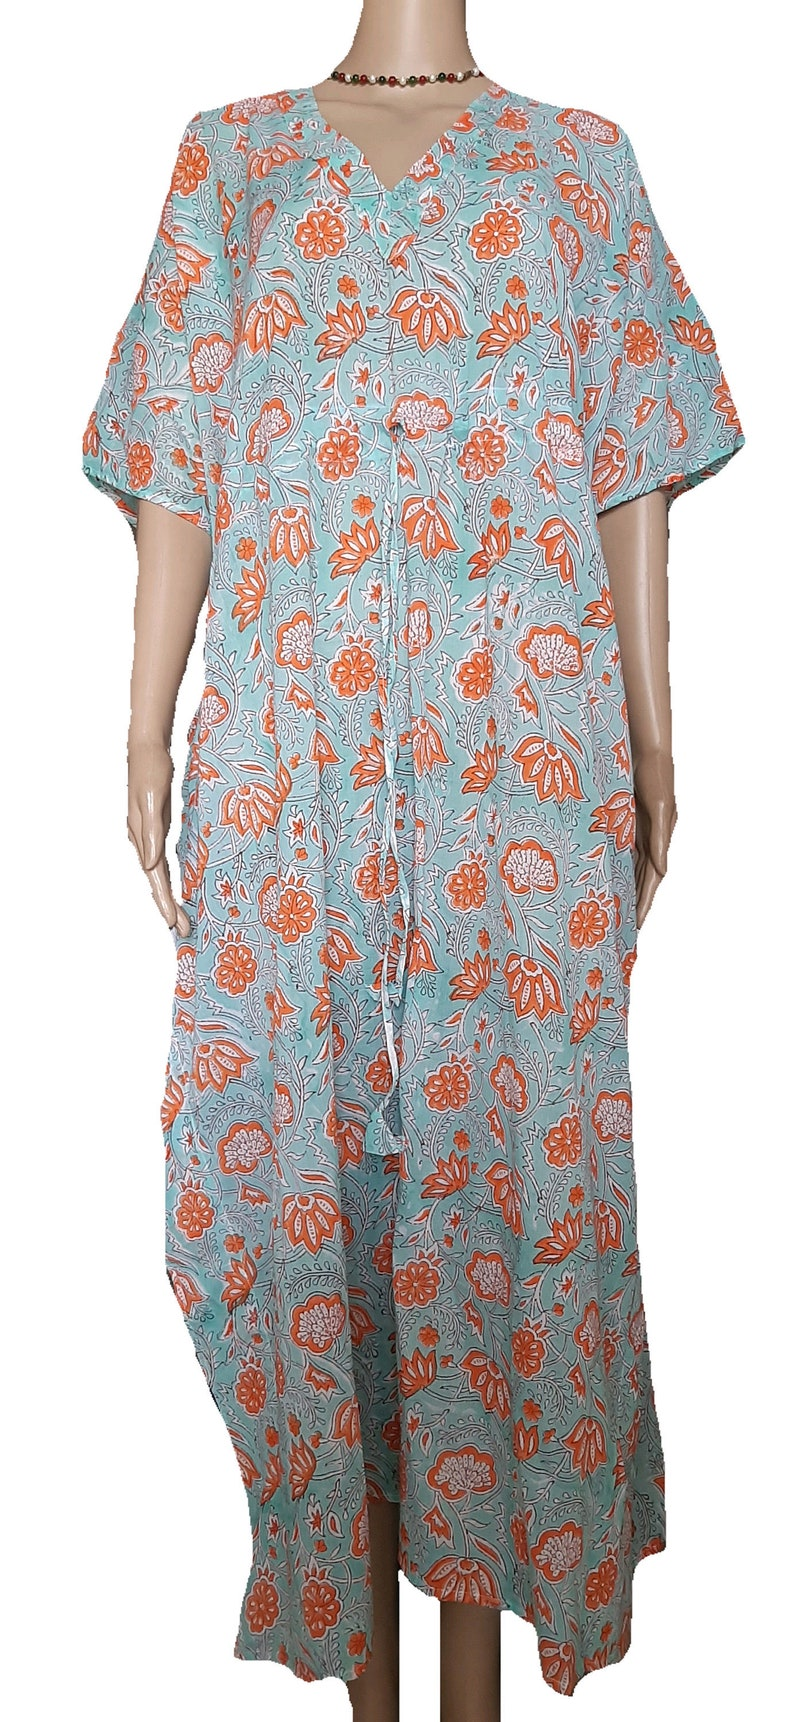 Indian Cotton Kaftan Handmade Block Print Long Robes Maxi Night Suit Ethnic Kurta Gown kaftan Beach cover up Swim Wear Yoga Top Women Tunic